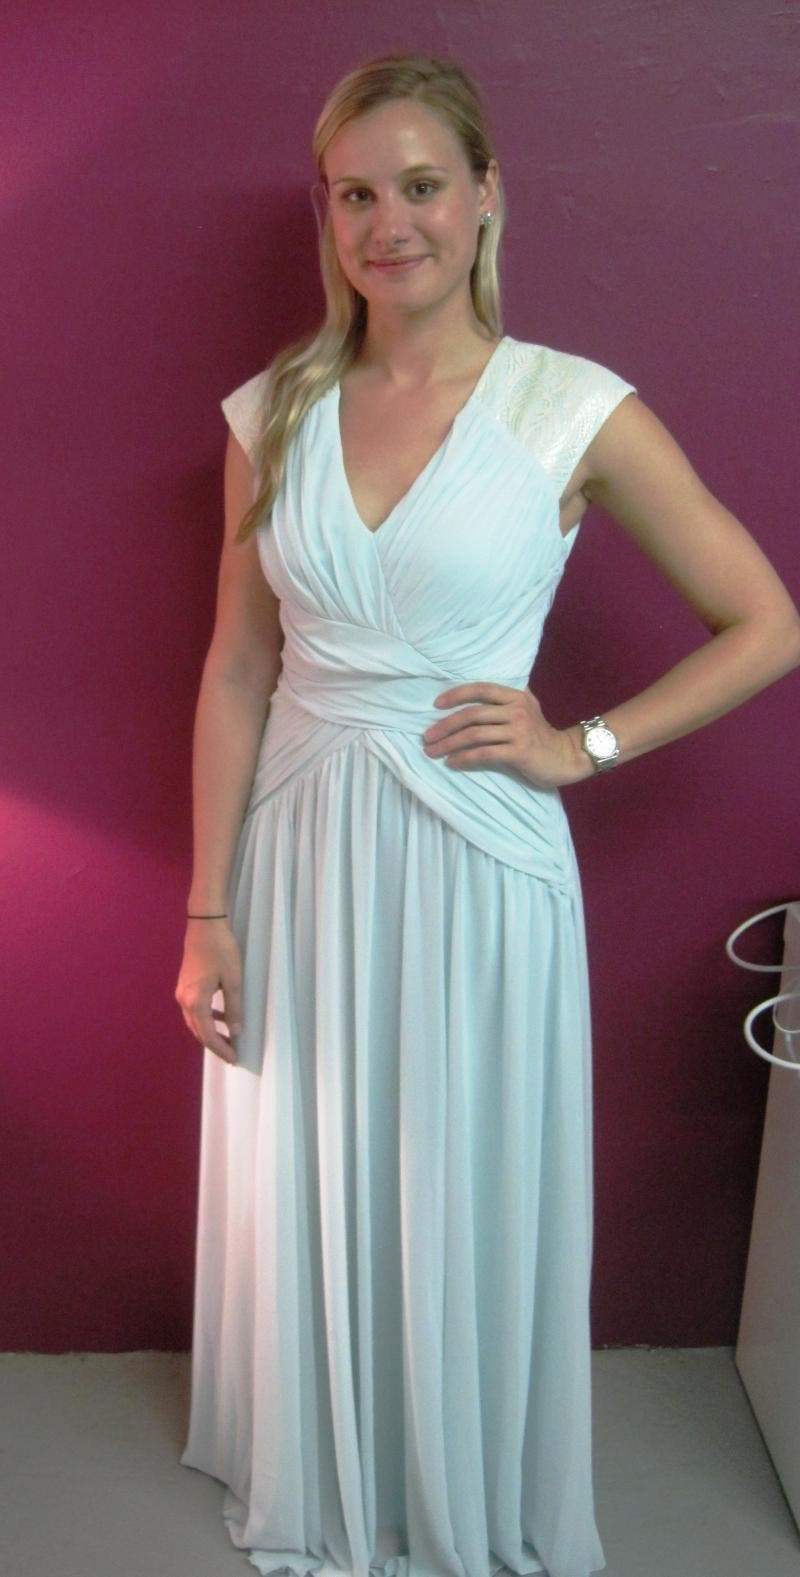 Rent Mint Dream Gown from Badgley Mischka - 283458 | Rent the Runway